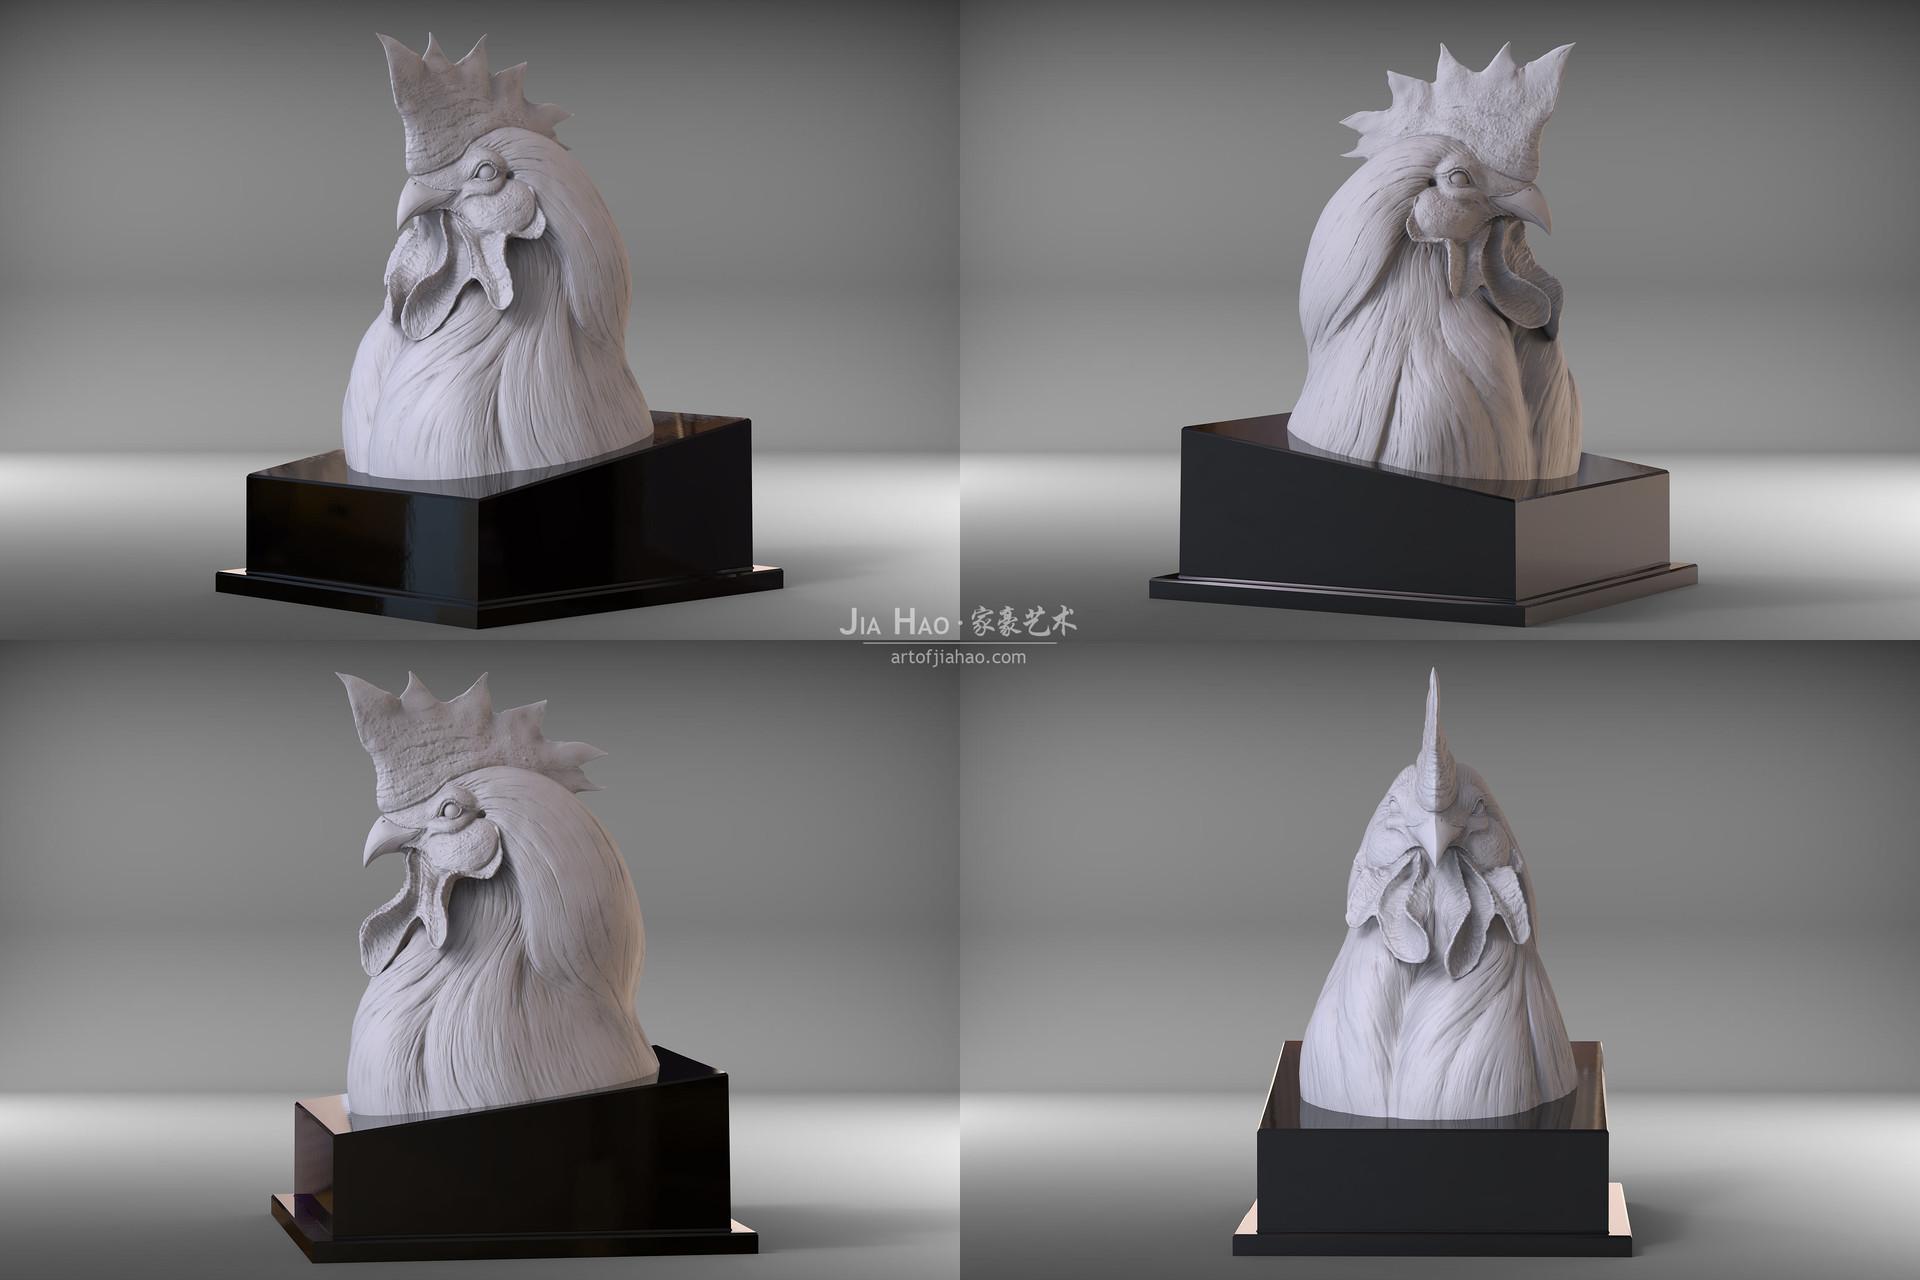 Jia hao 2017 sculpture majesticrooster modelpresentation